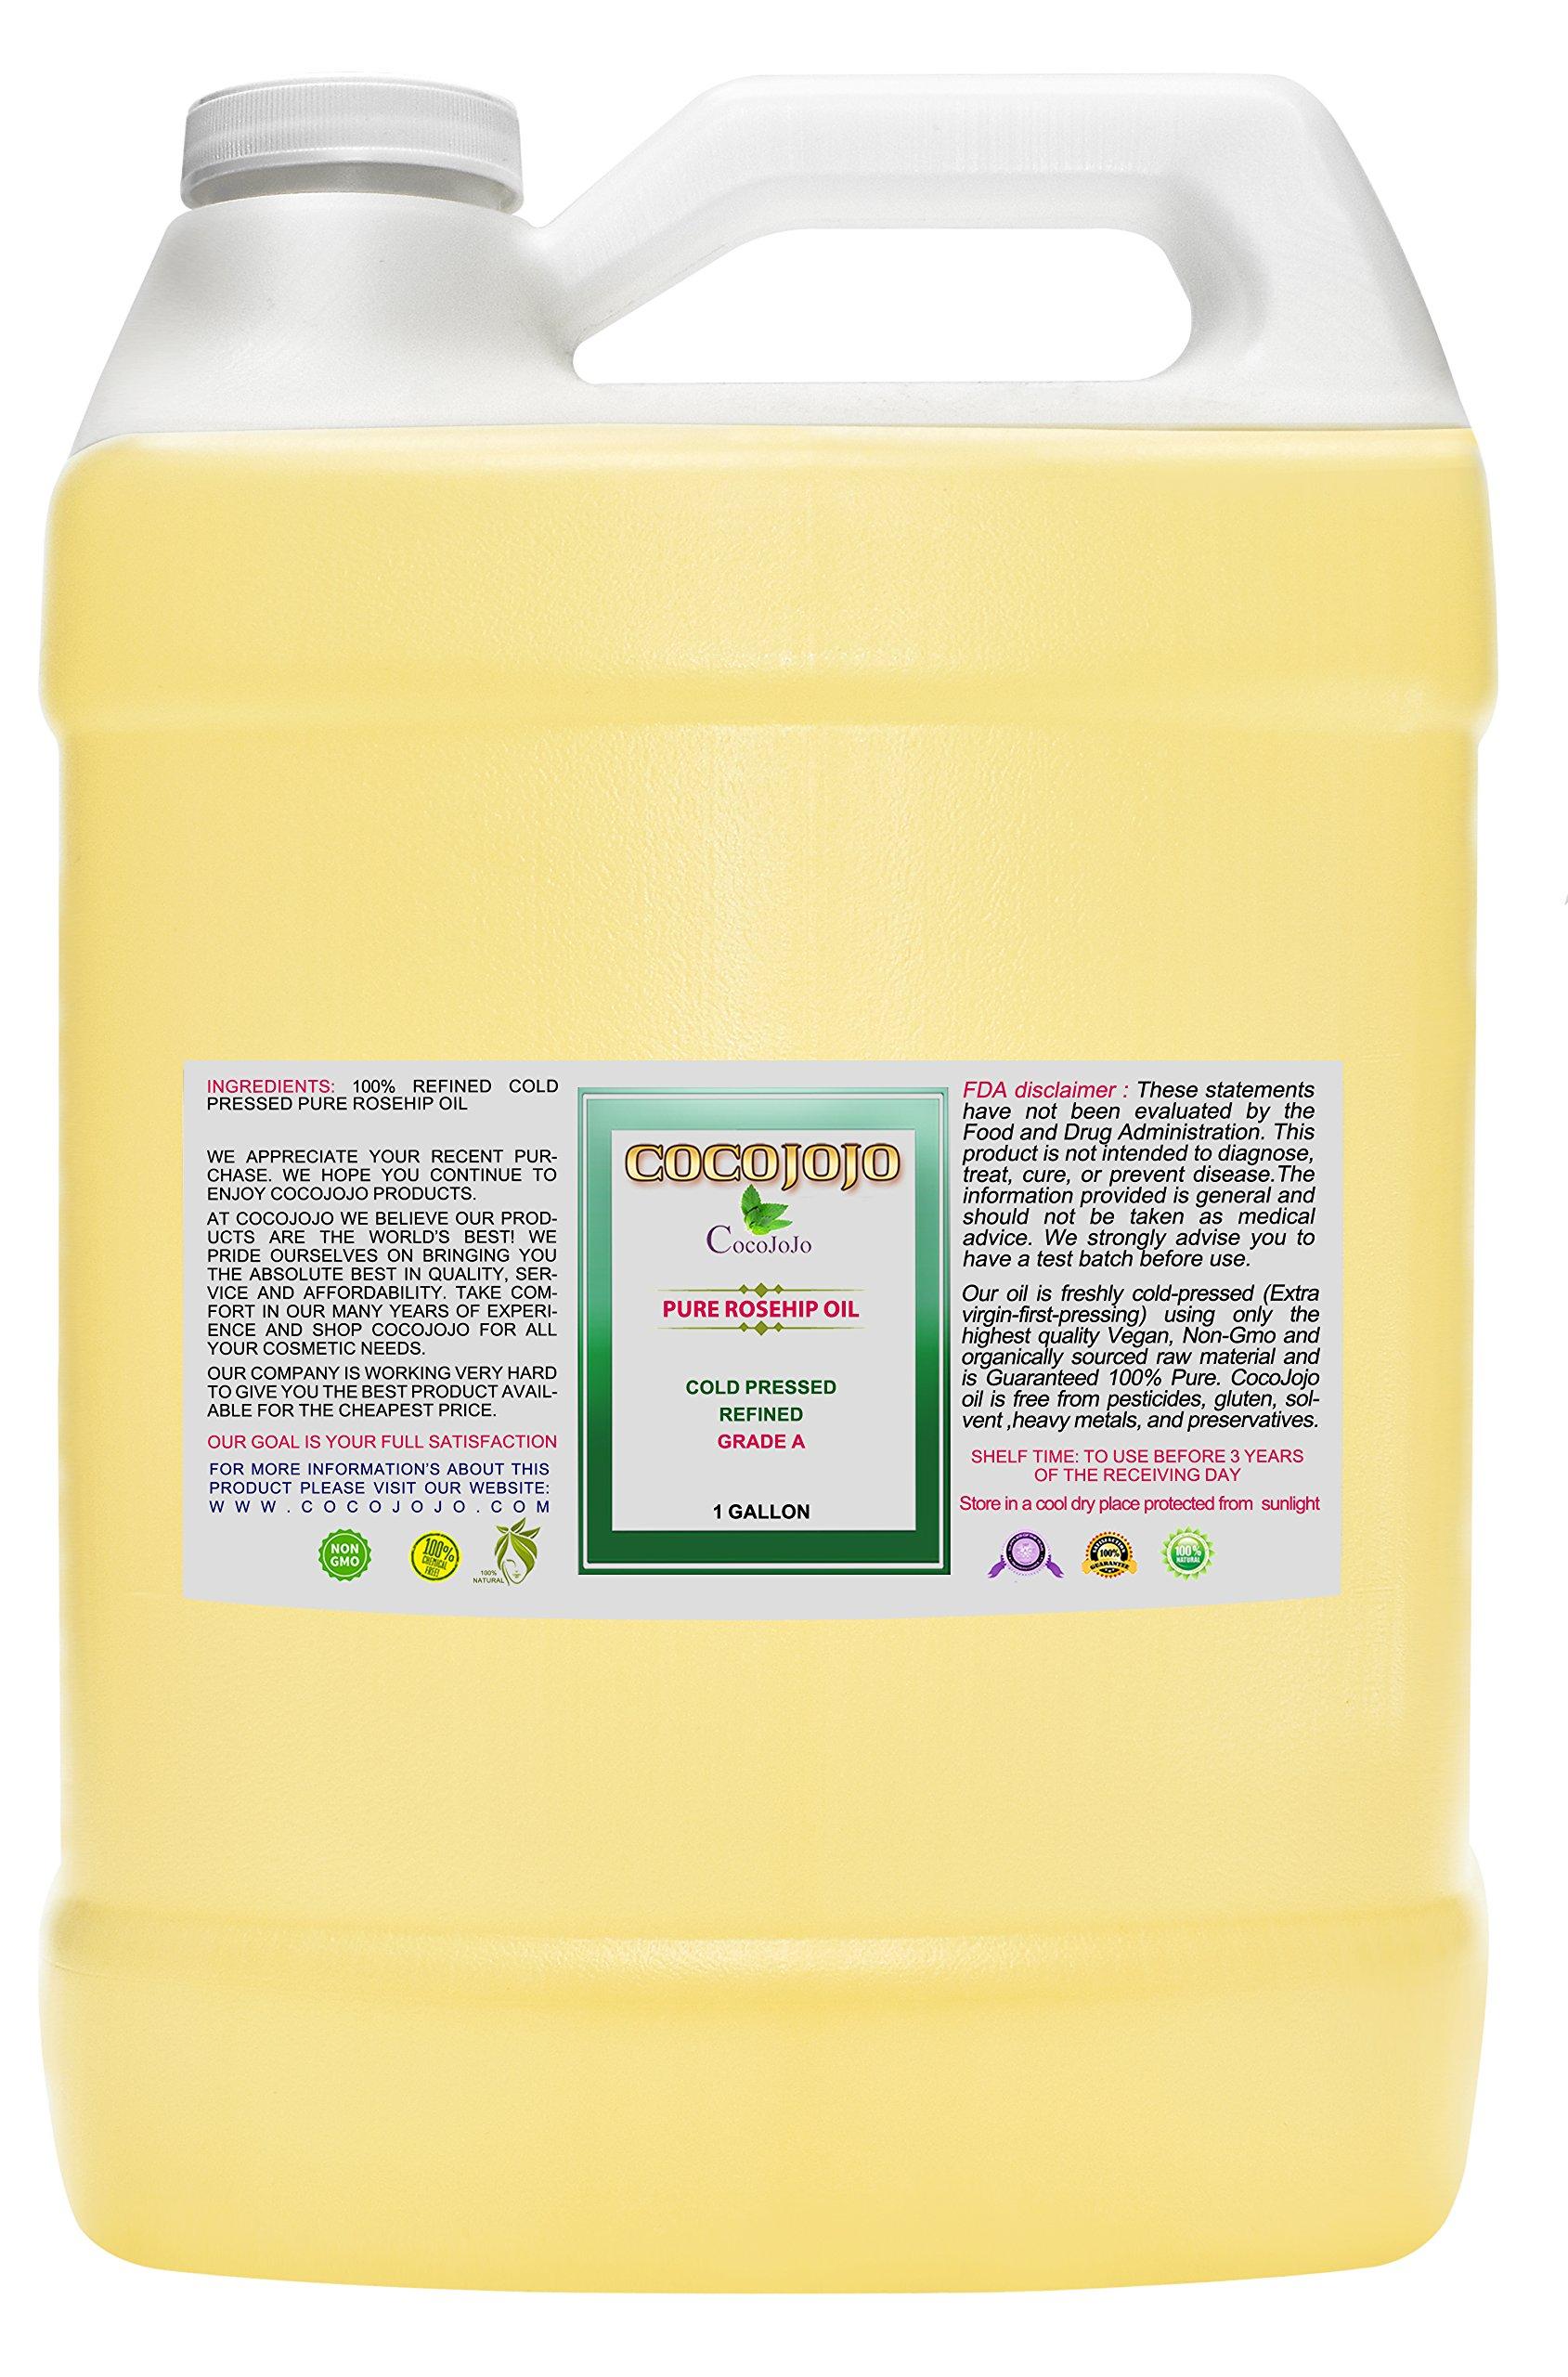 Rosehip Oil - 100% Pure Natural Seed Oil Cold Pressed 1 GALLON Face Skin Refined Premium Grade